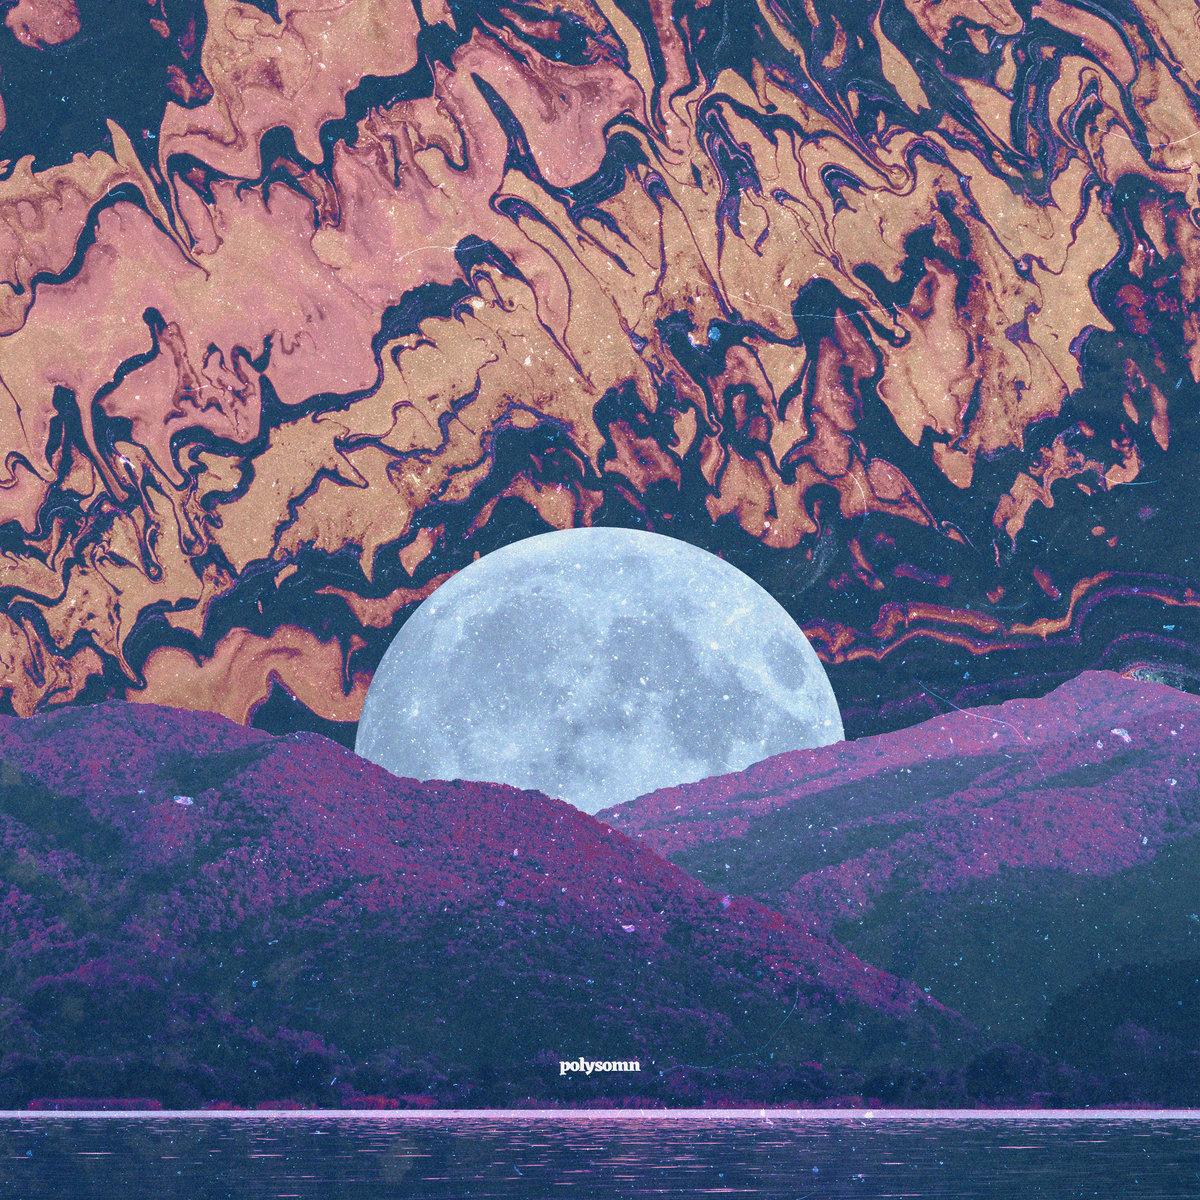 Kairon; Irse! - Polysomn [2xLP] (Purple Vinyl)